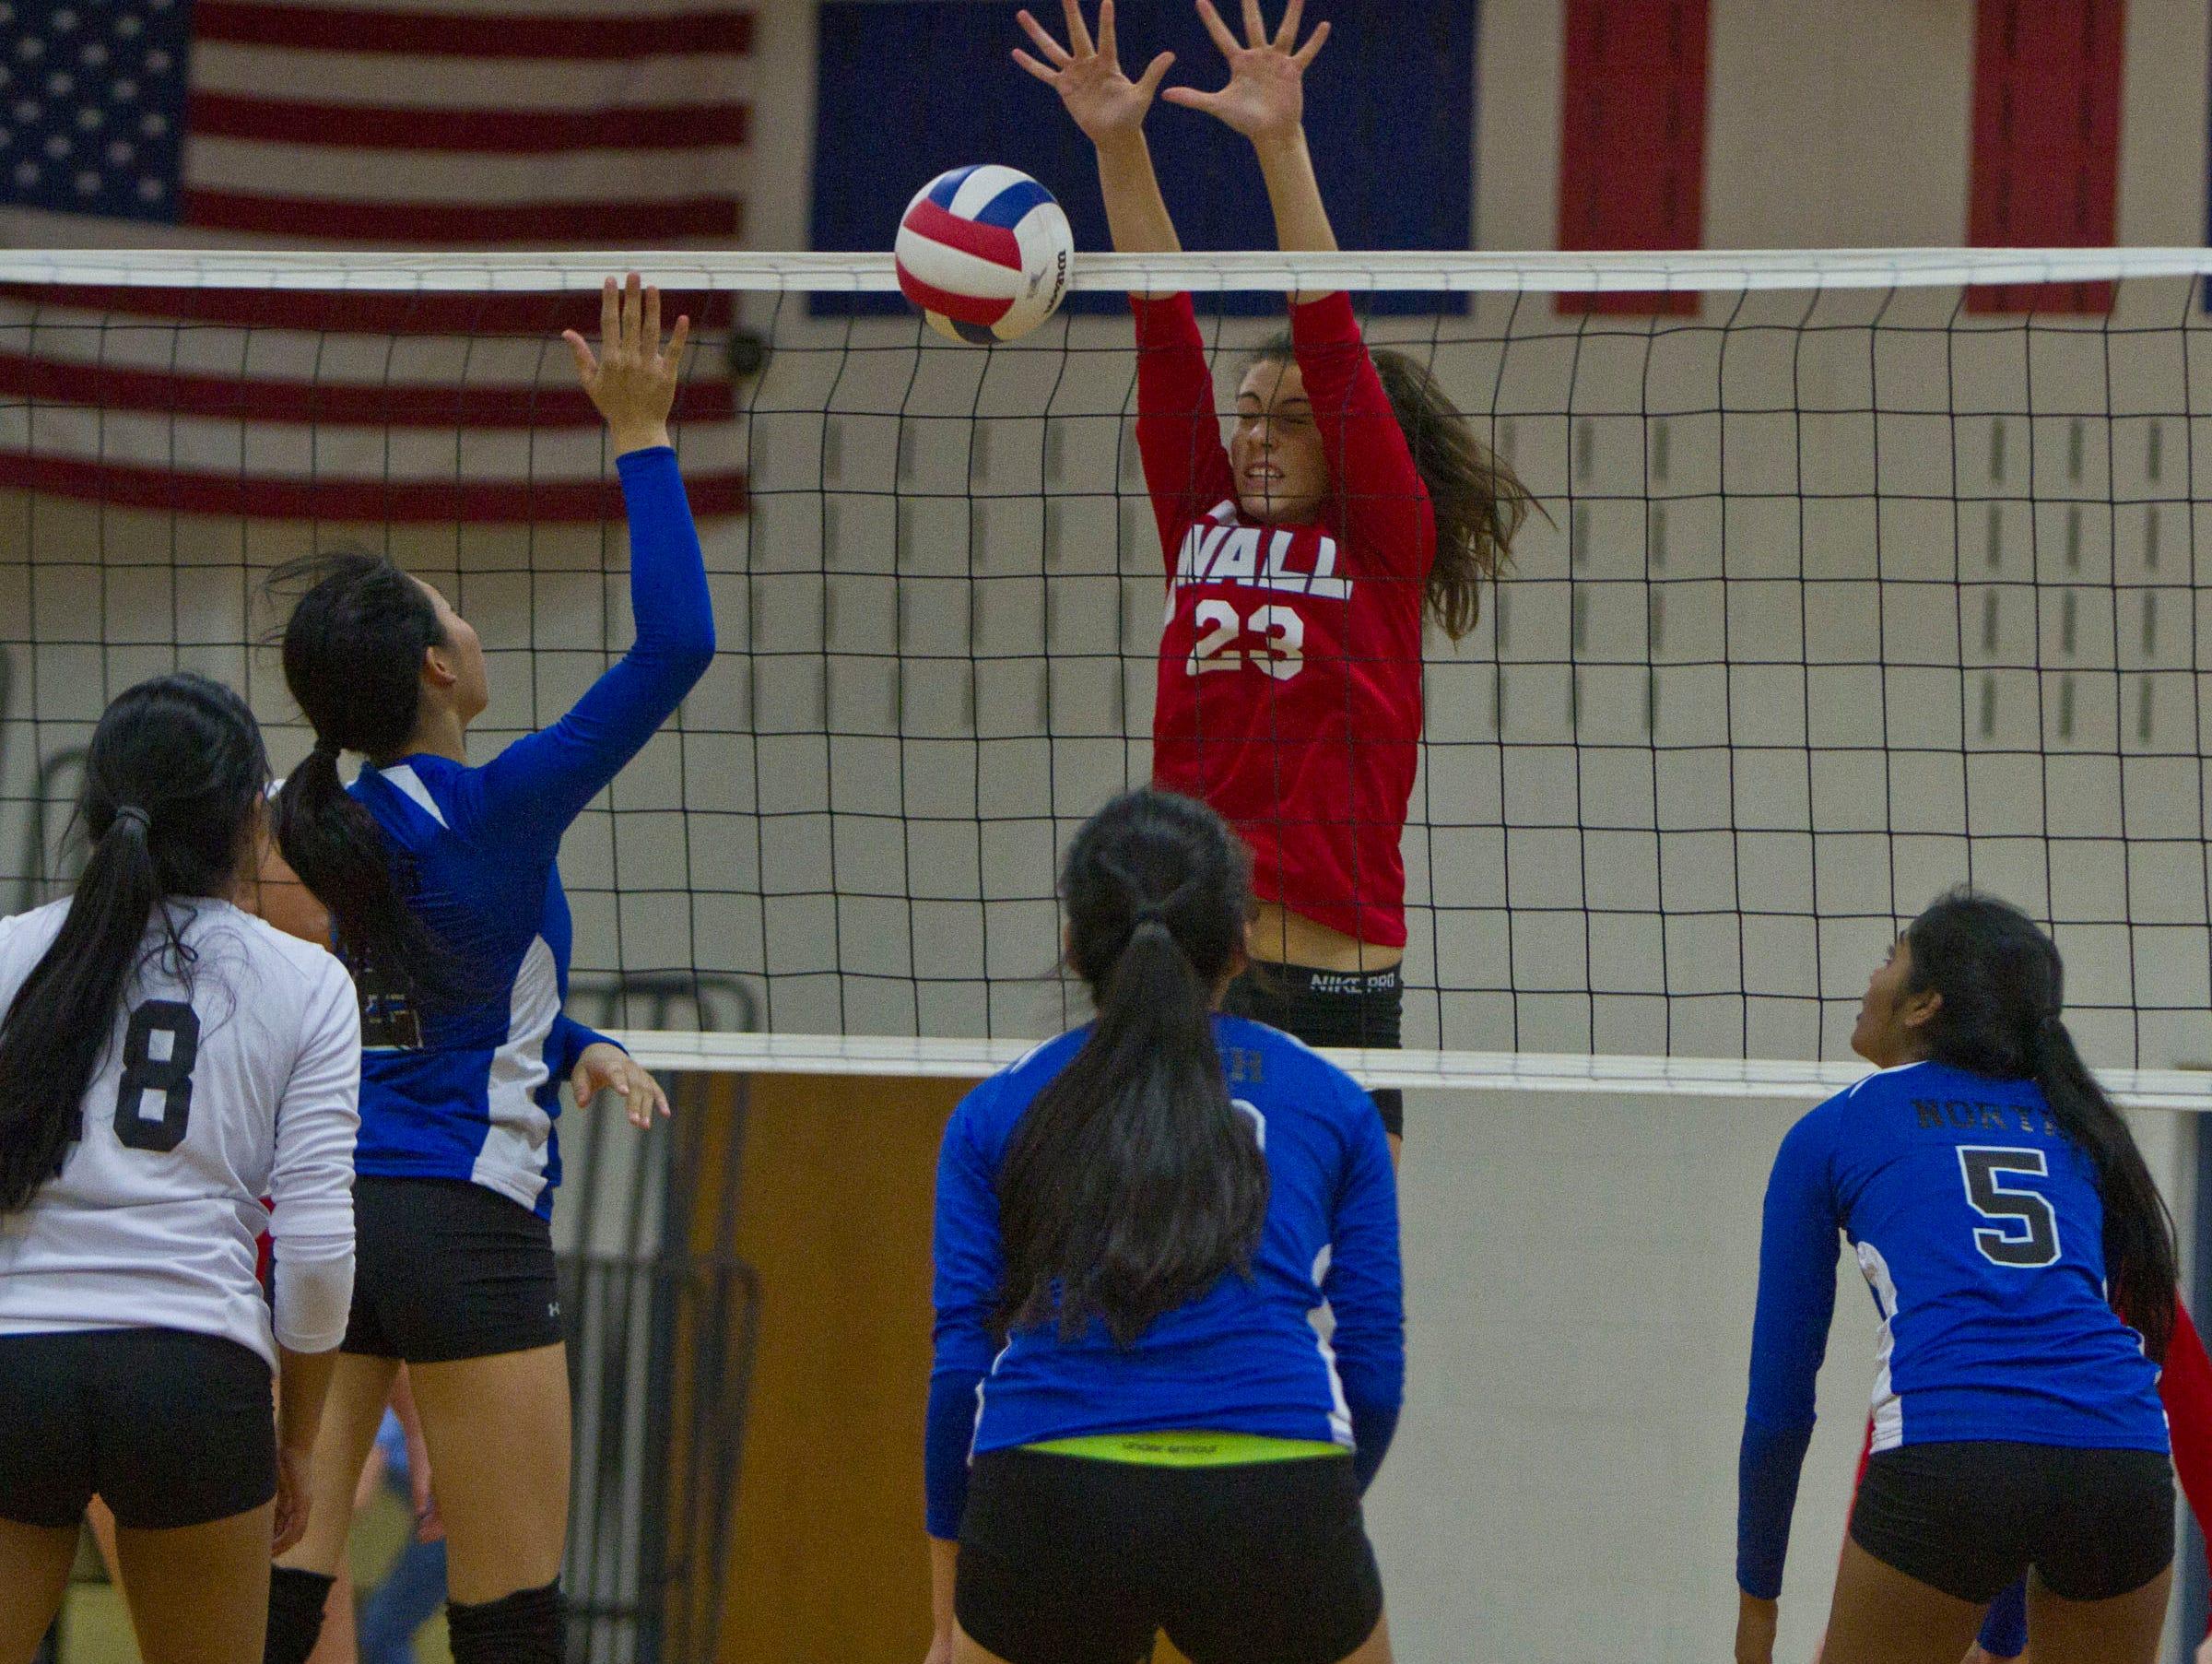 Wall's Tara Casuccio blocks a shot. NJSIAA volleyball match between Wall and West Windsor Plainsboro North. Wall Township, NJ Wednesday, November 4, 2015 @dhoodhood